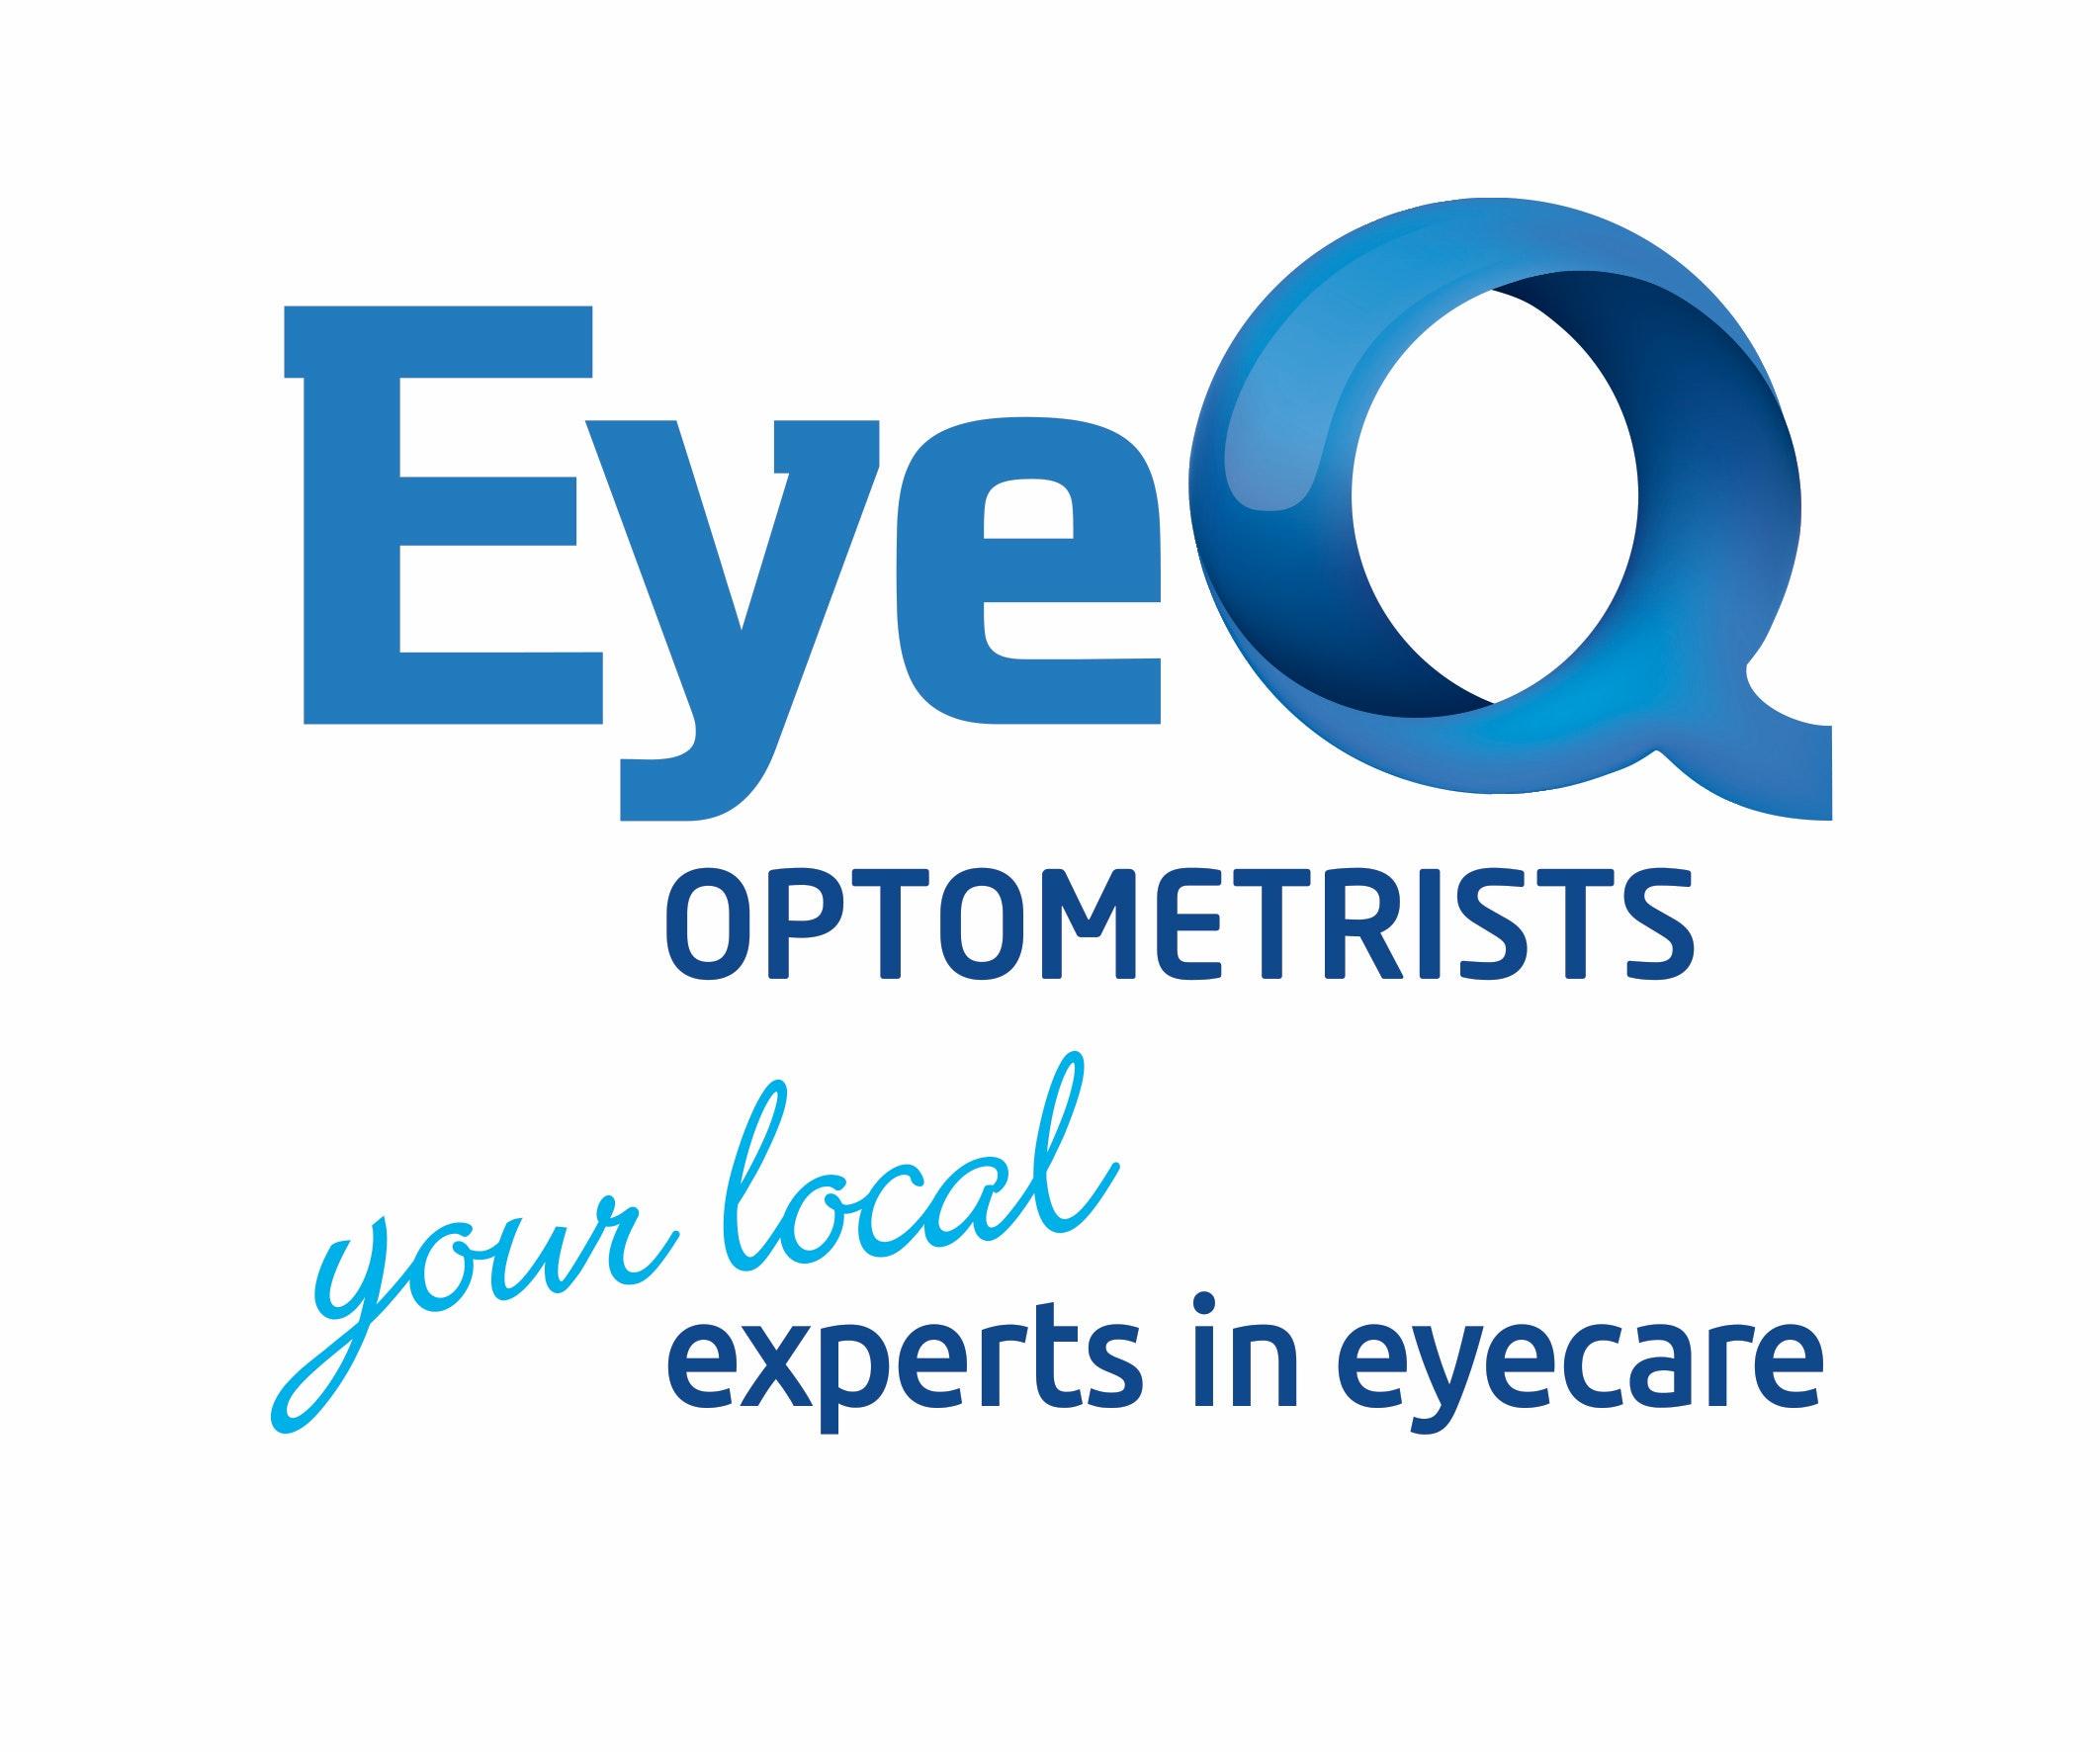 logo for EyeQ Optometrists Karrinyup Optometrists